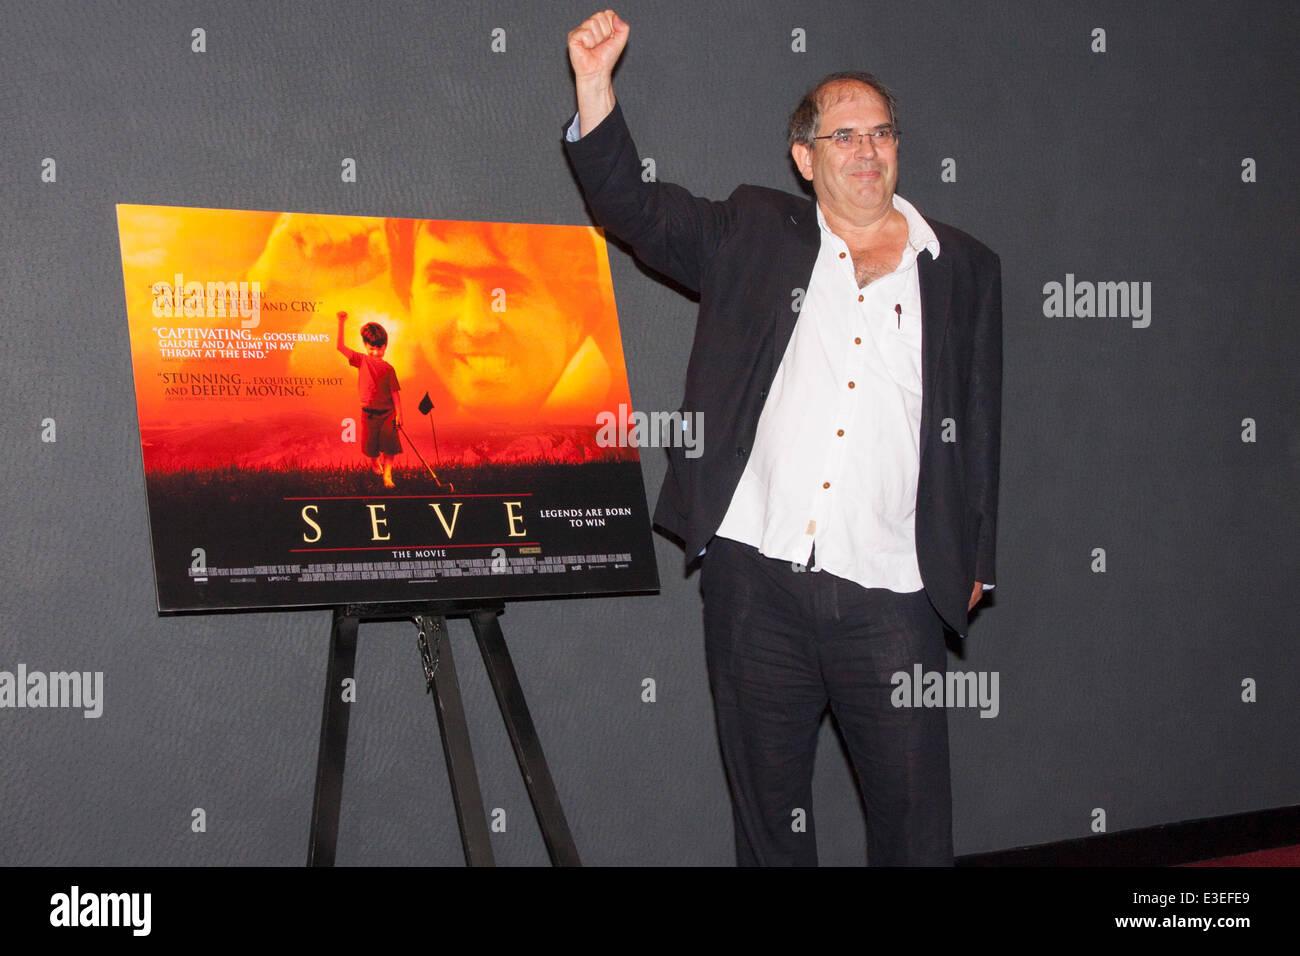 London, UK. 23rd June, 2014. John-Paul Davidson, Director, at the premiere of his film Seve, a biopic of the life - Stock Image